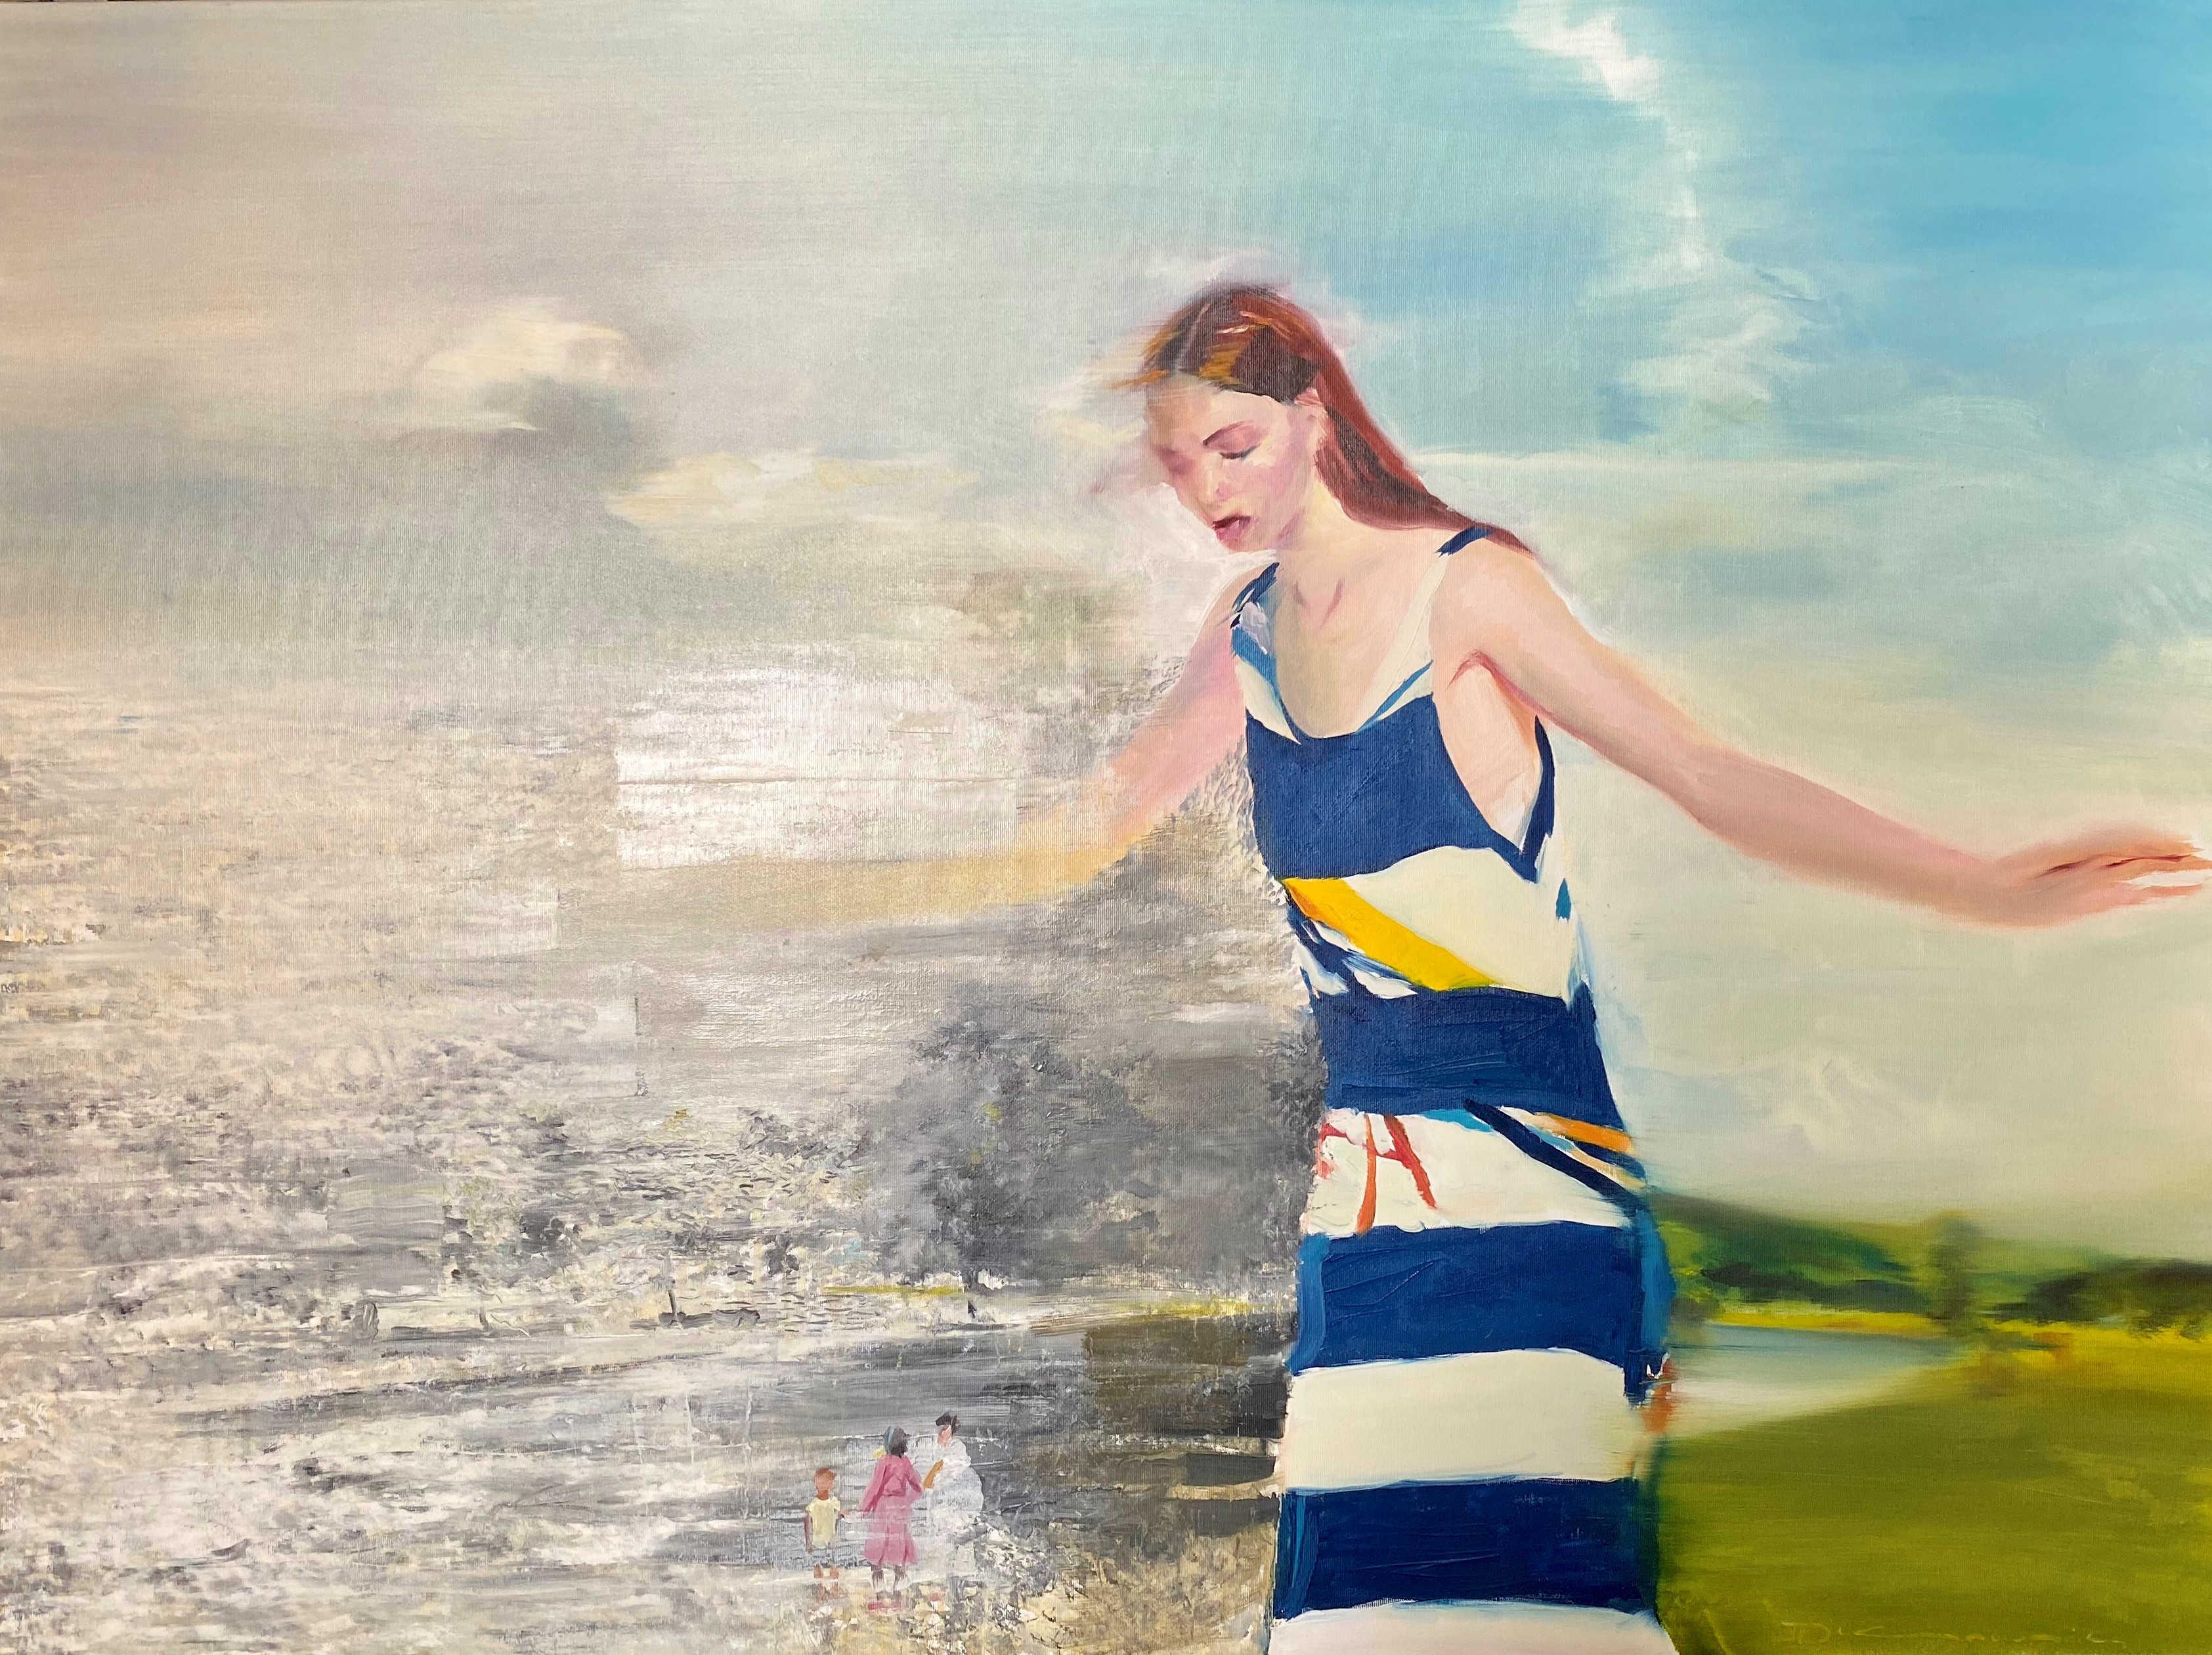 Dimos Kipouros (Greek), Survivor IV, 2019, oil on canvas, 90 x 120 cm